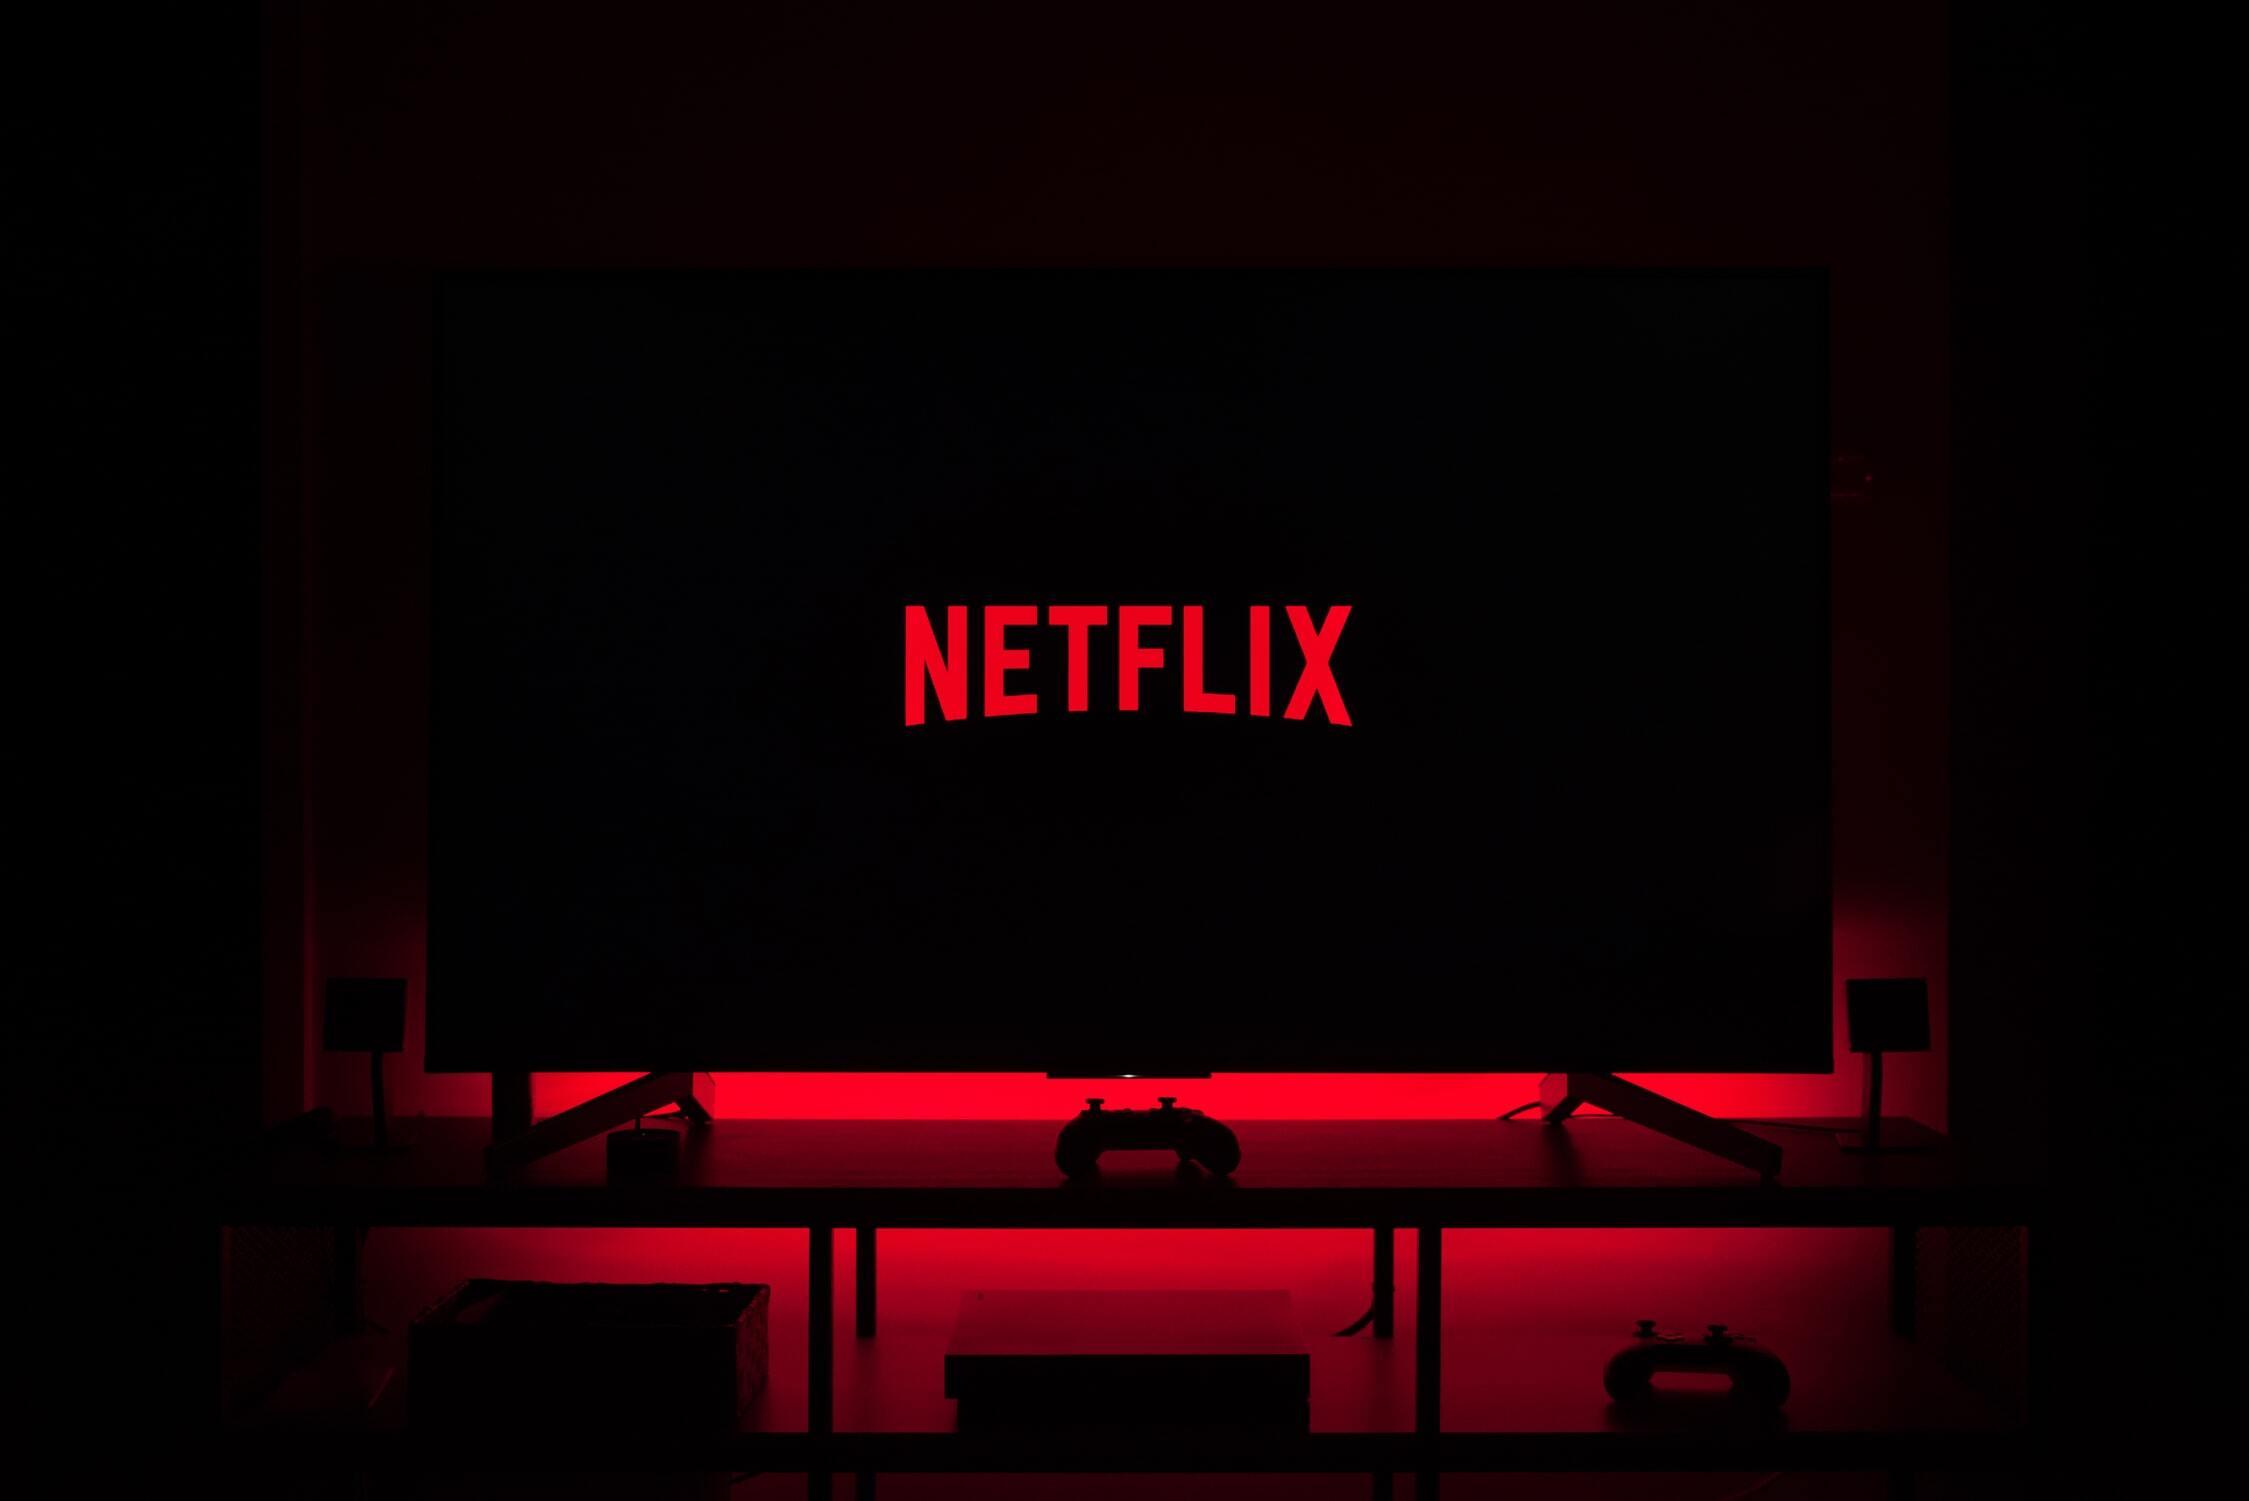 Código de error de Netflix M7353-5101